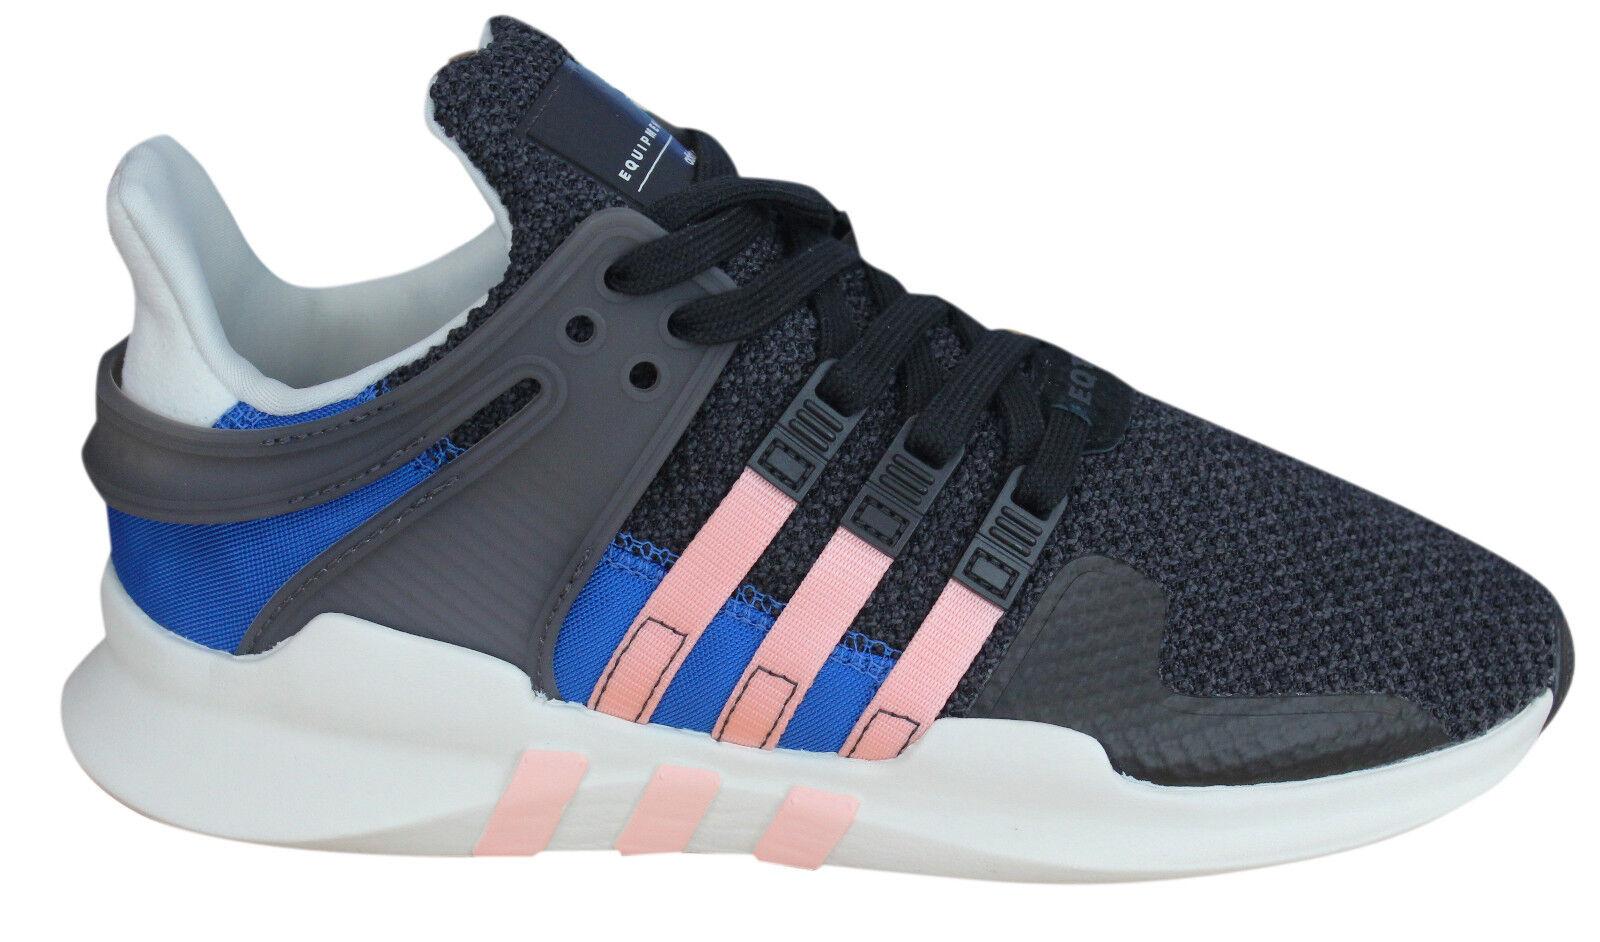 Adidas originali attrezzatura relevant voraus, da Damens scarpe ginnastica nero